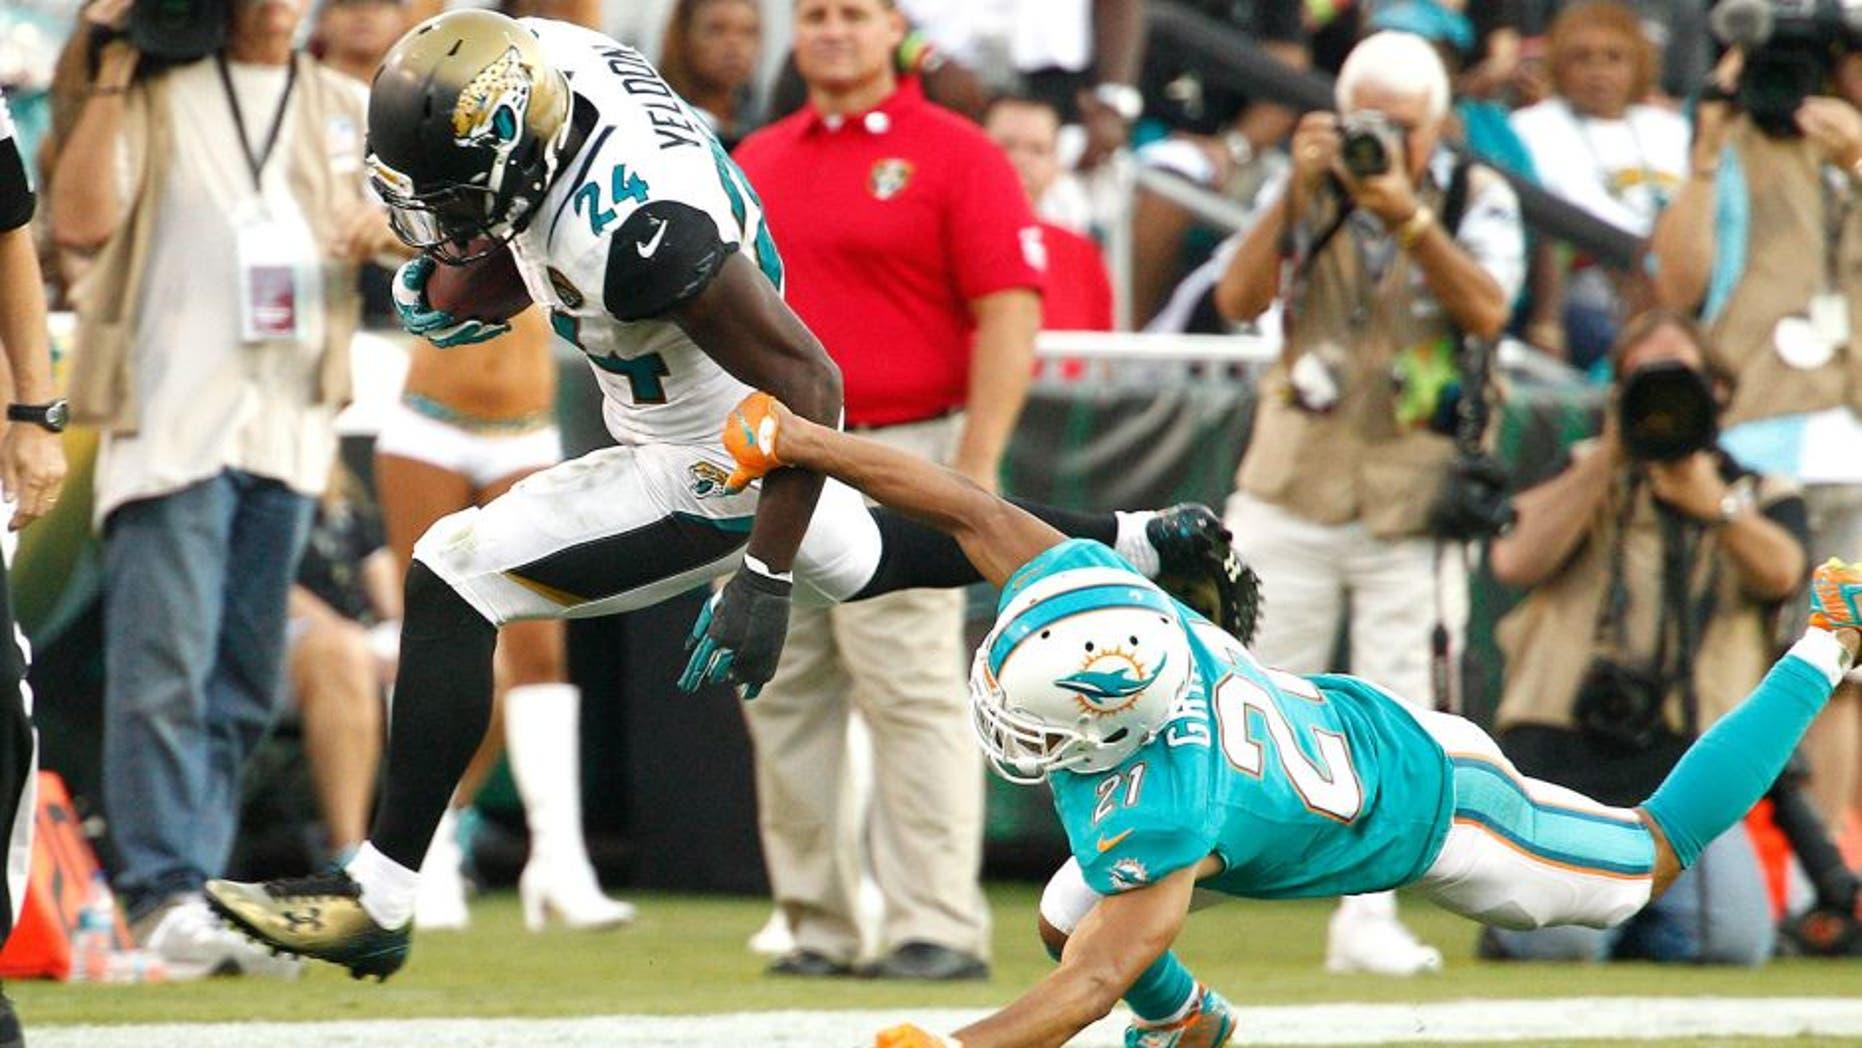 Sep 20, 2015; Jacksonville, FL, USA; Jacksonville Jaguars running back T.J. Yeldon (24) runs past Miami Dolphins cornerback Brent Grimes (21) during the second half of an NFL Football game at EverBank Field. The Jacksonville Jaguars won 23-20. Mandatory Credit: Reinhold Matay-USA TODAY Sports